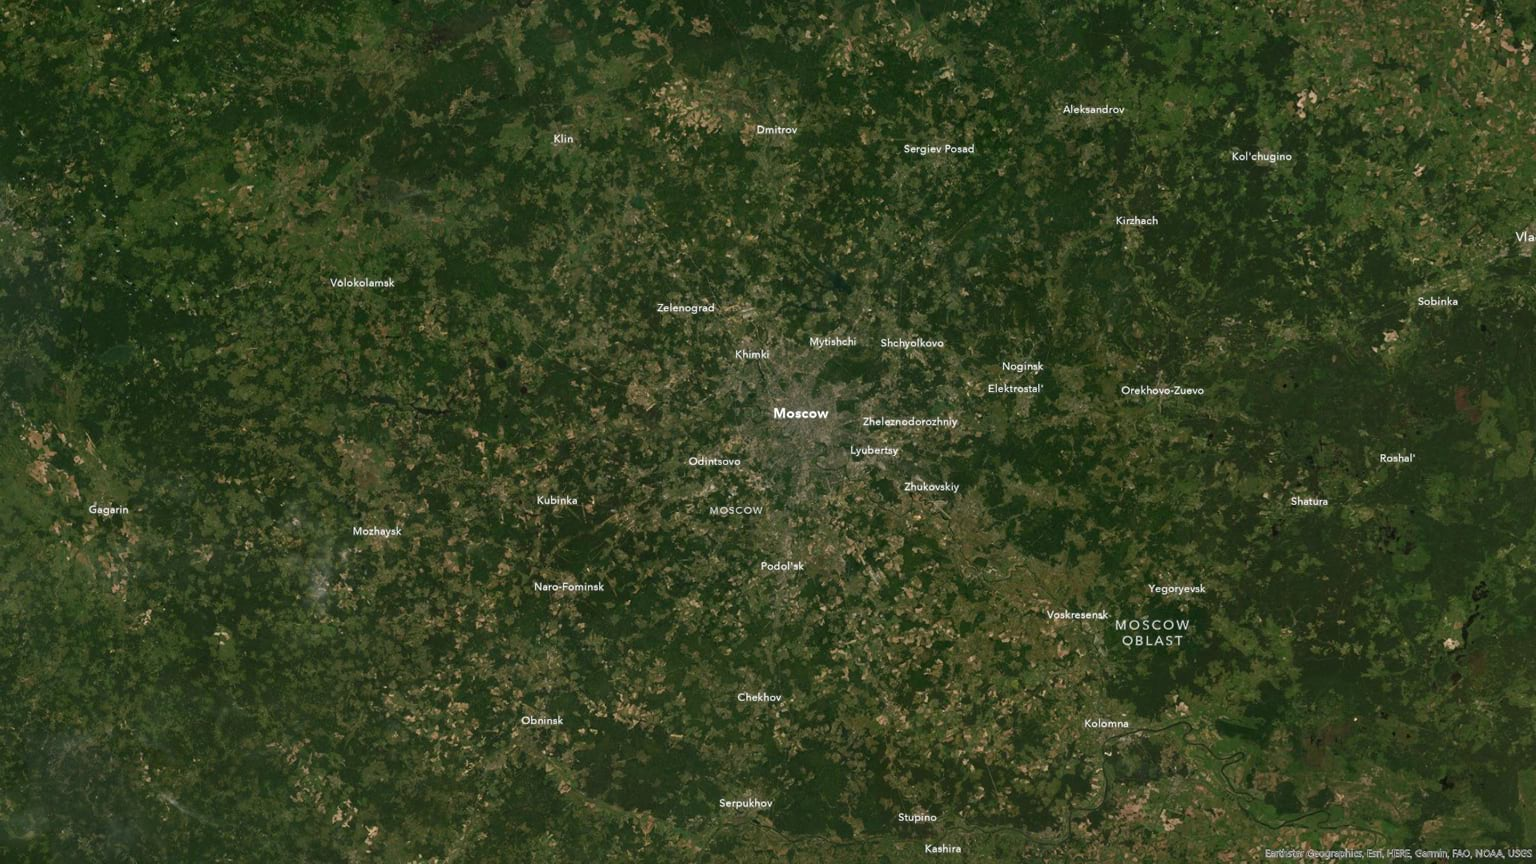 Moscow has very little terrain.